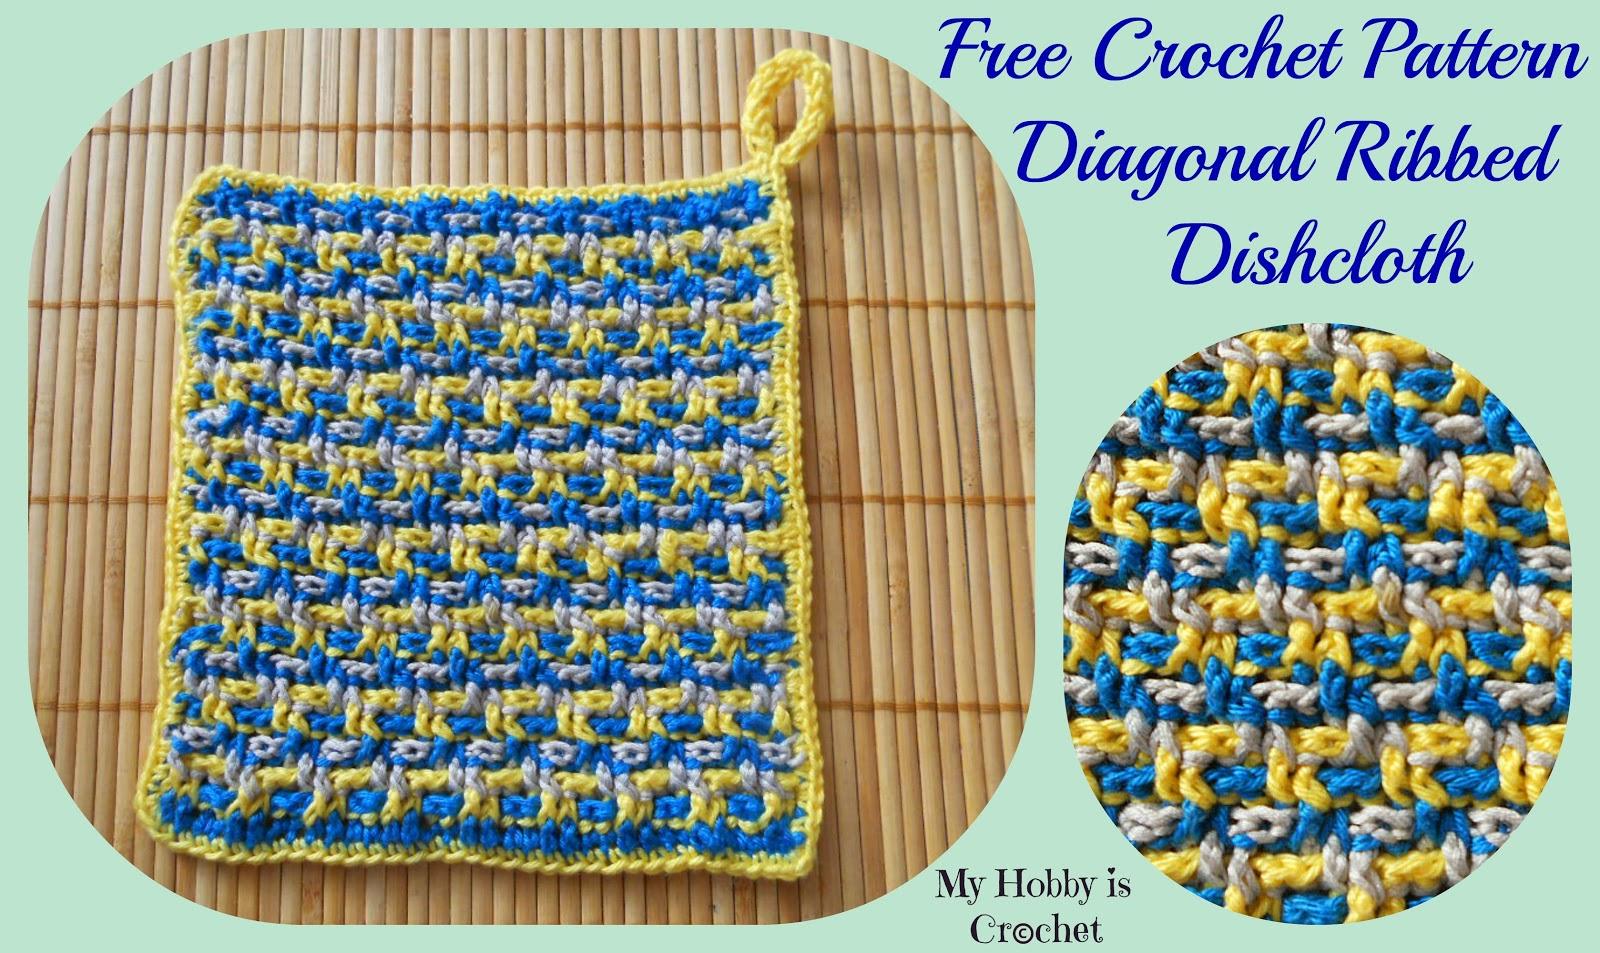 Fiber flux 30 free crochet dishcloth patterns diagonal ribbed dishcloth from my hobby is crochet bankloansurffo Choice Image